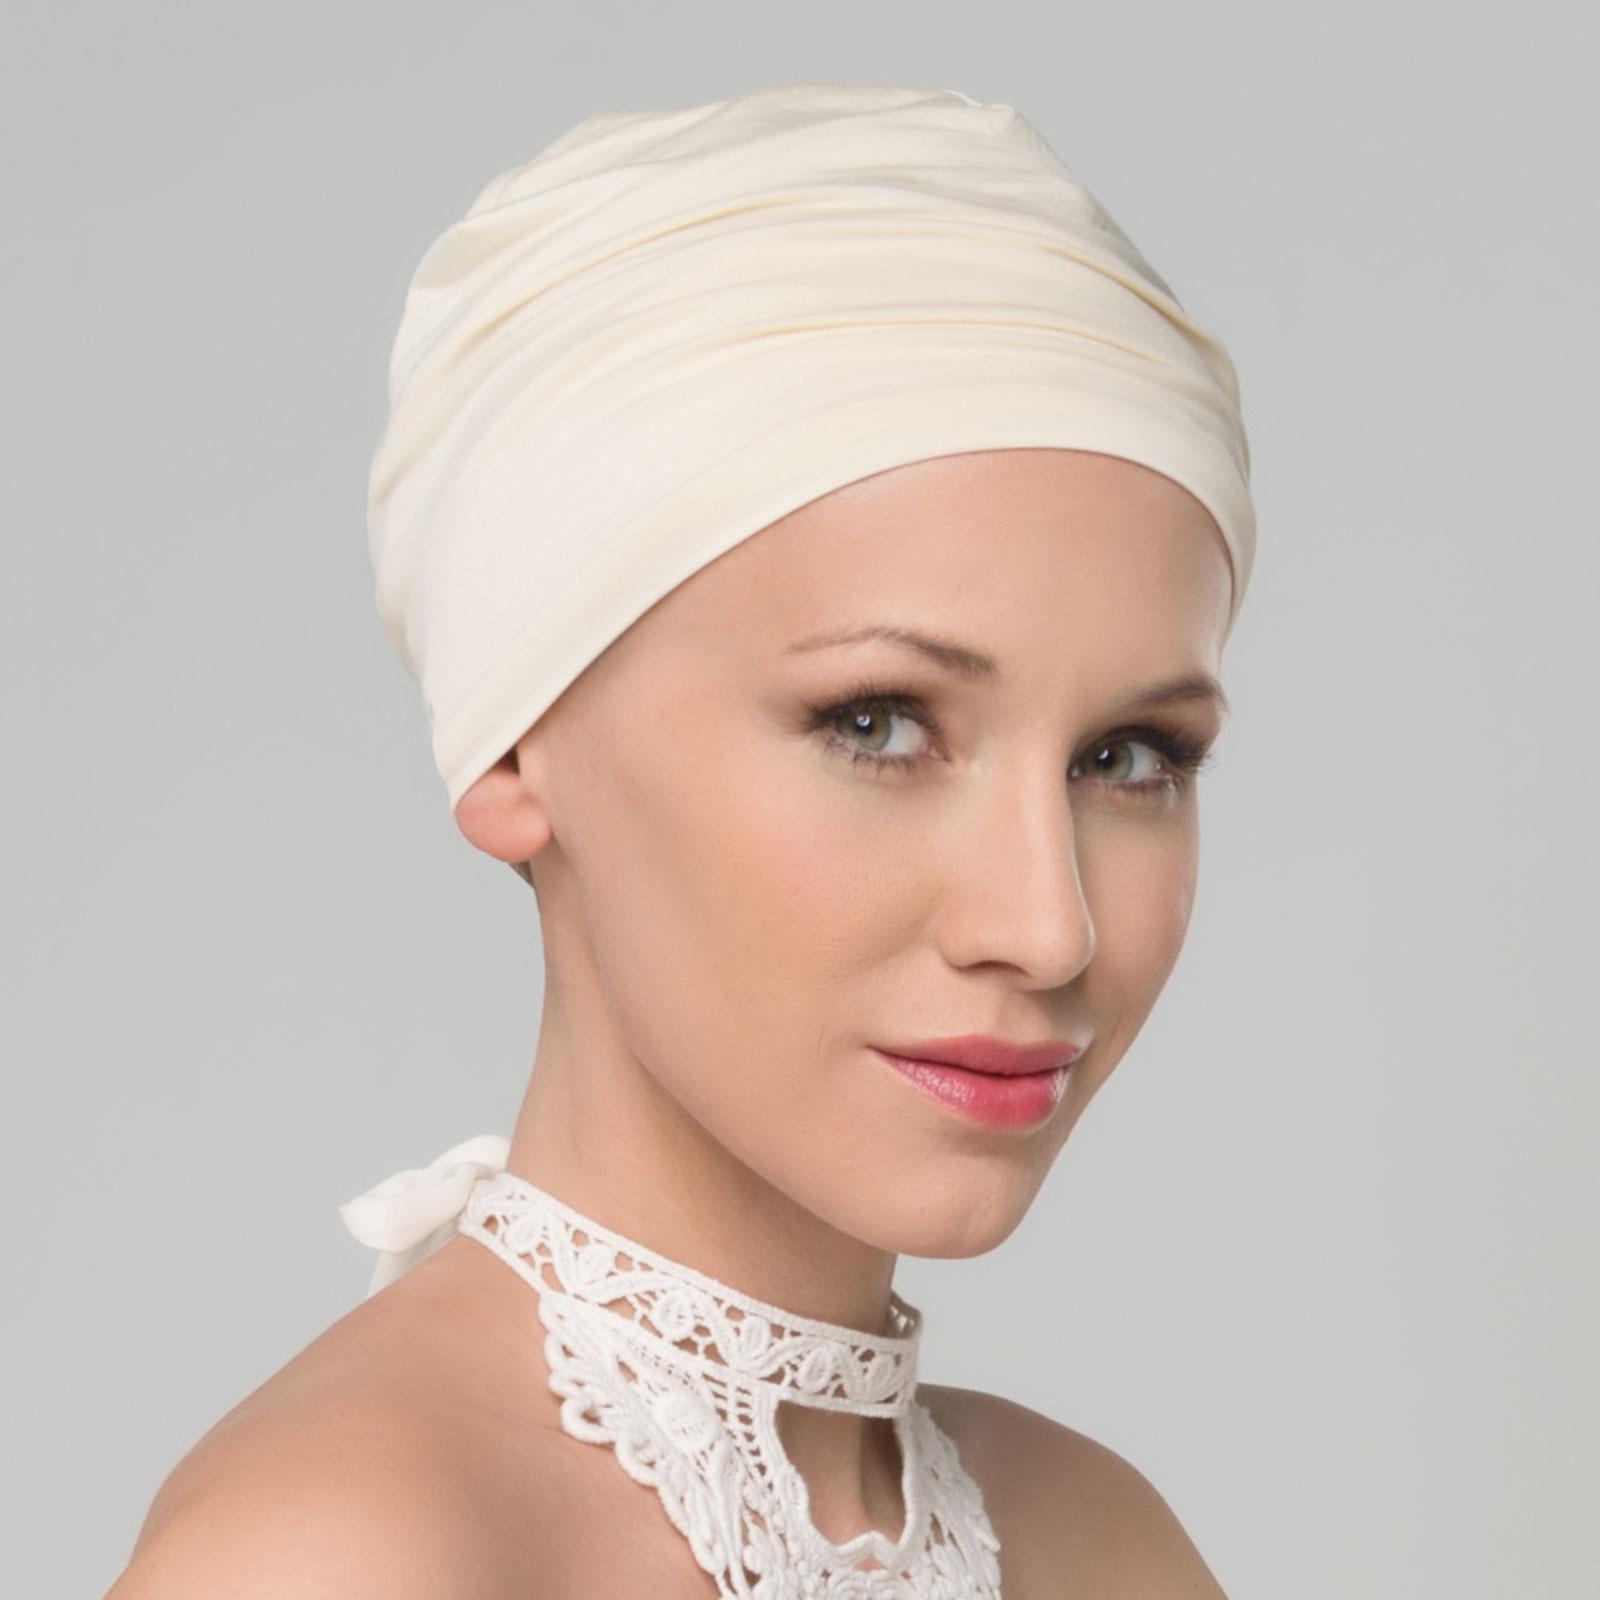 ellens headwear - minya